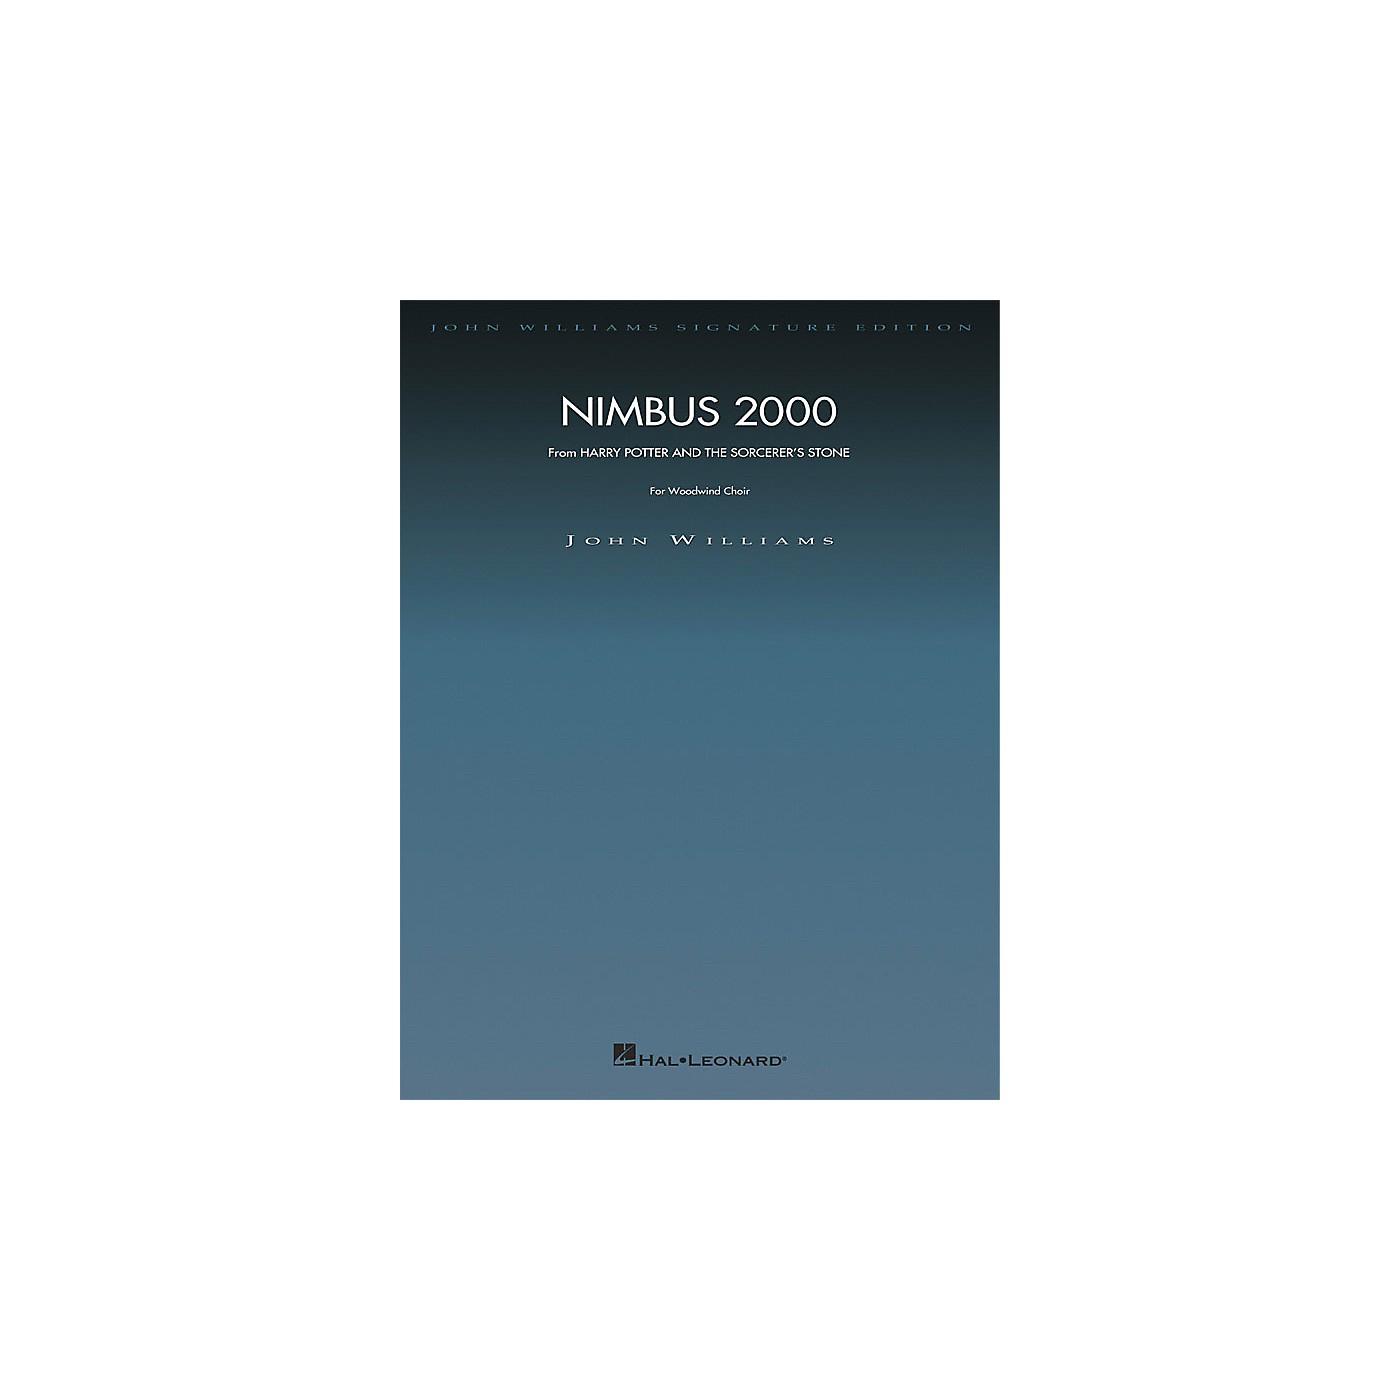 Hal Leonard Nimbus 2000 (from Harry Potter and the Sorceror's Stone) John Williams Signature Edition - Woodwinds thumbnail